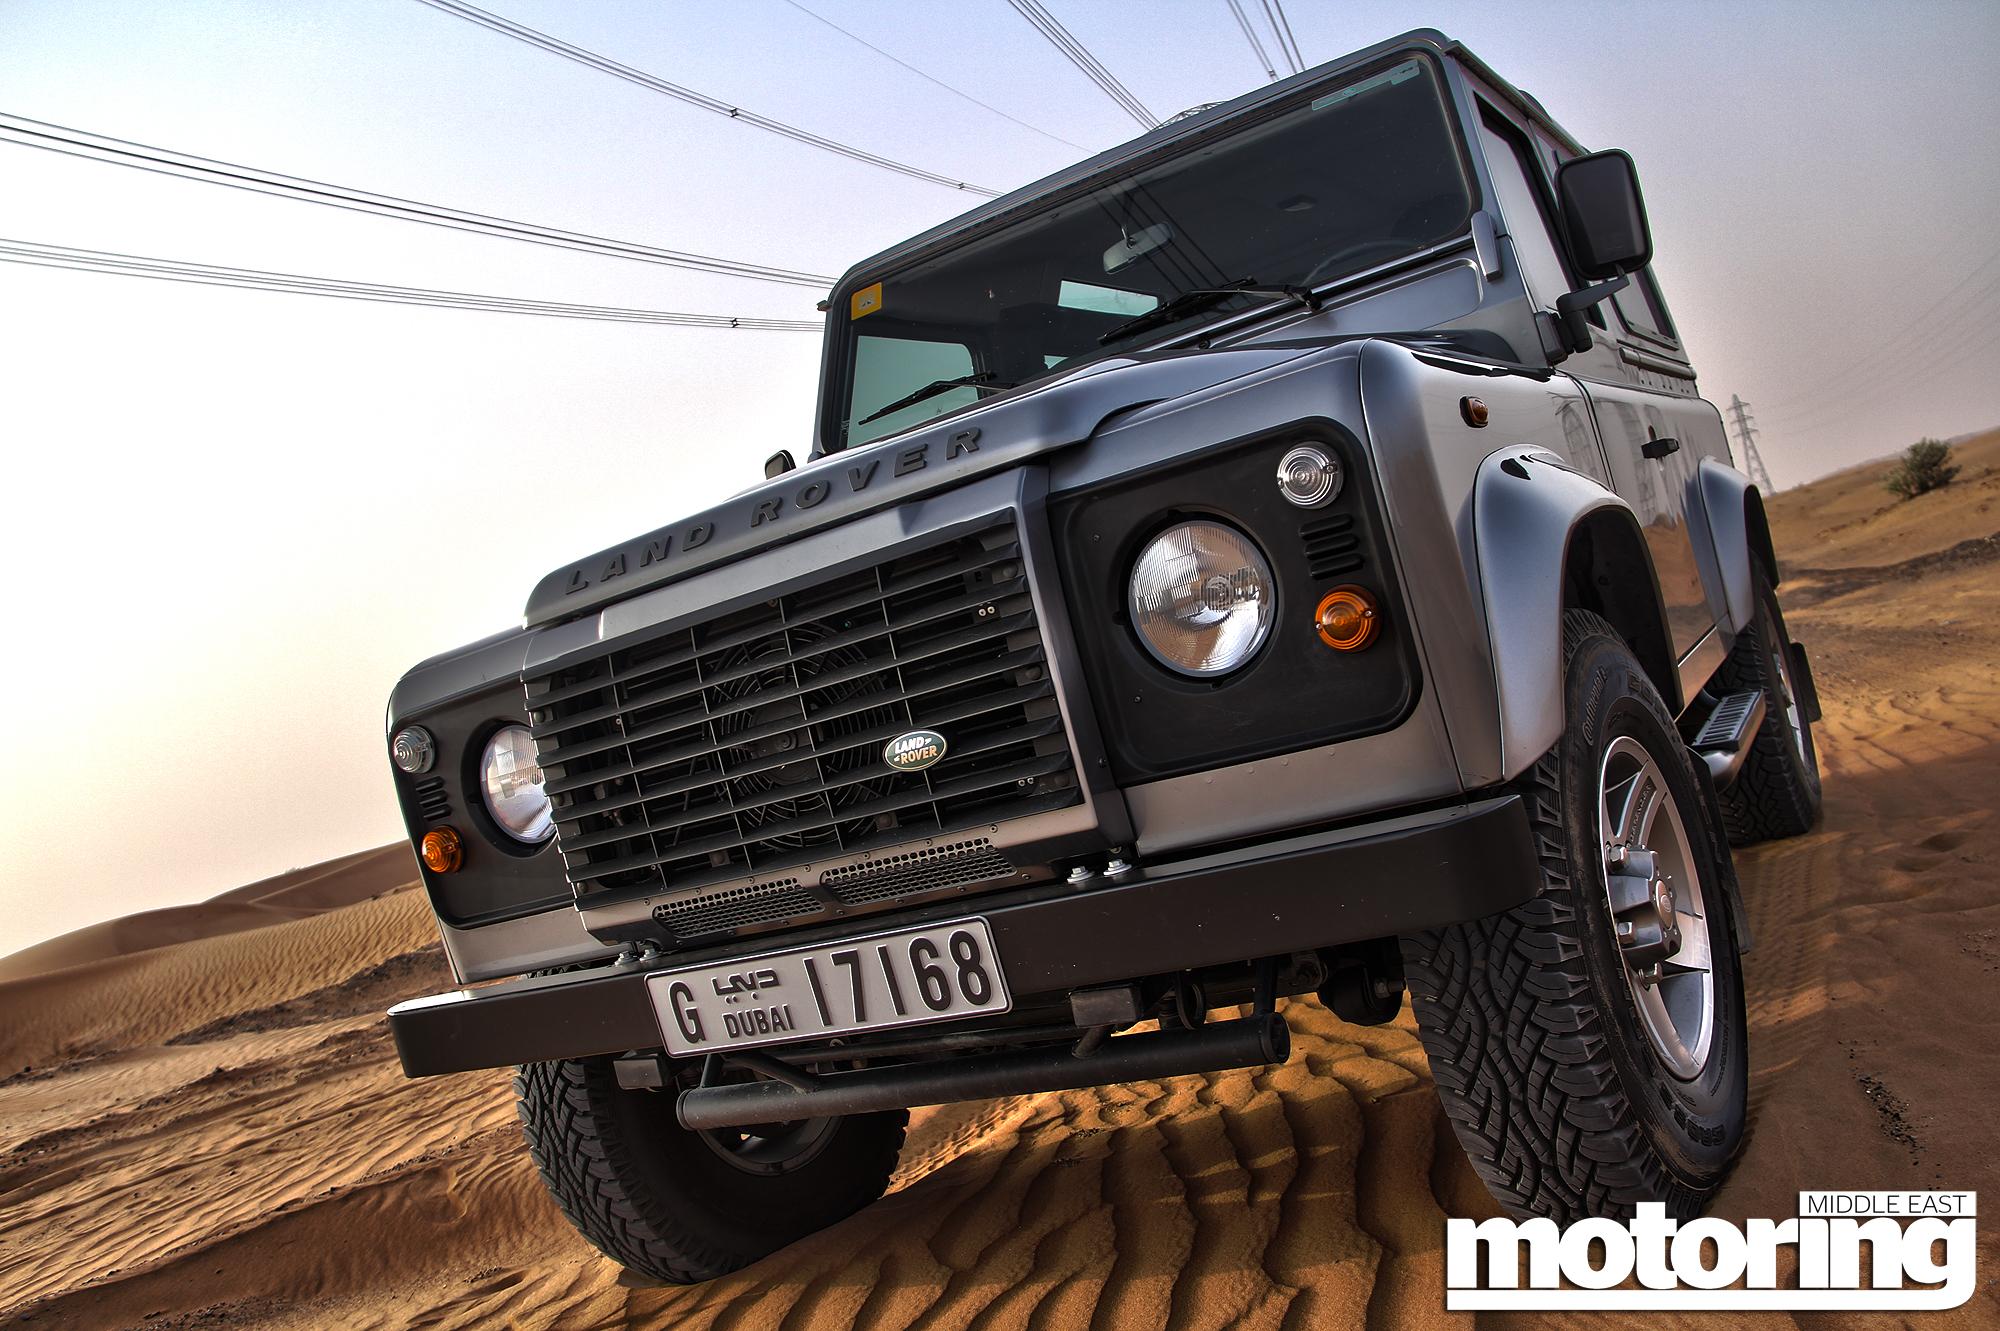 http://www.motoringme.com/wp-content/uploads/2013/09/Land-Rover-Defender-90-14.jpg